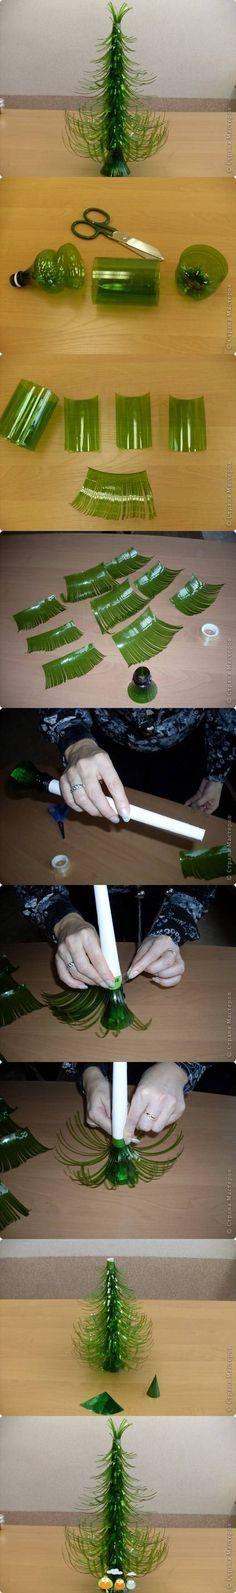 Nice idea! So cute